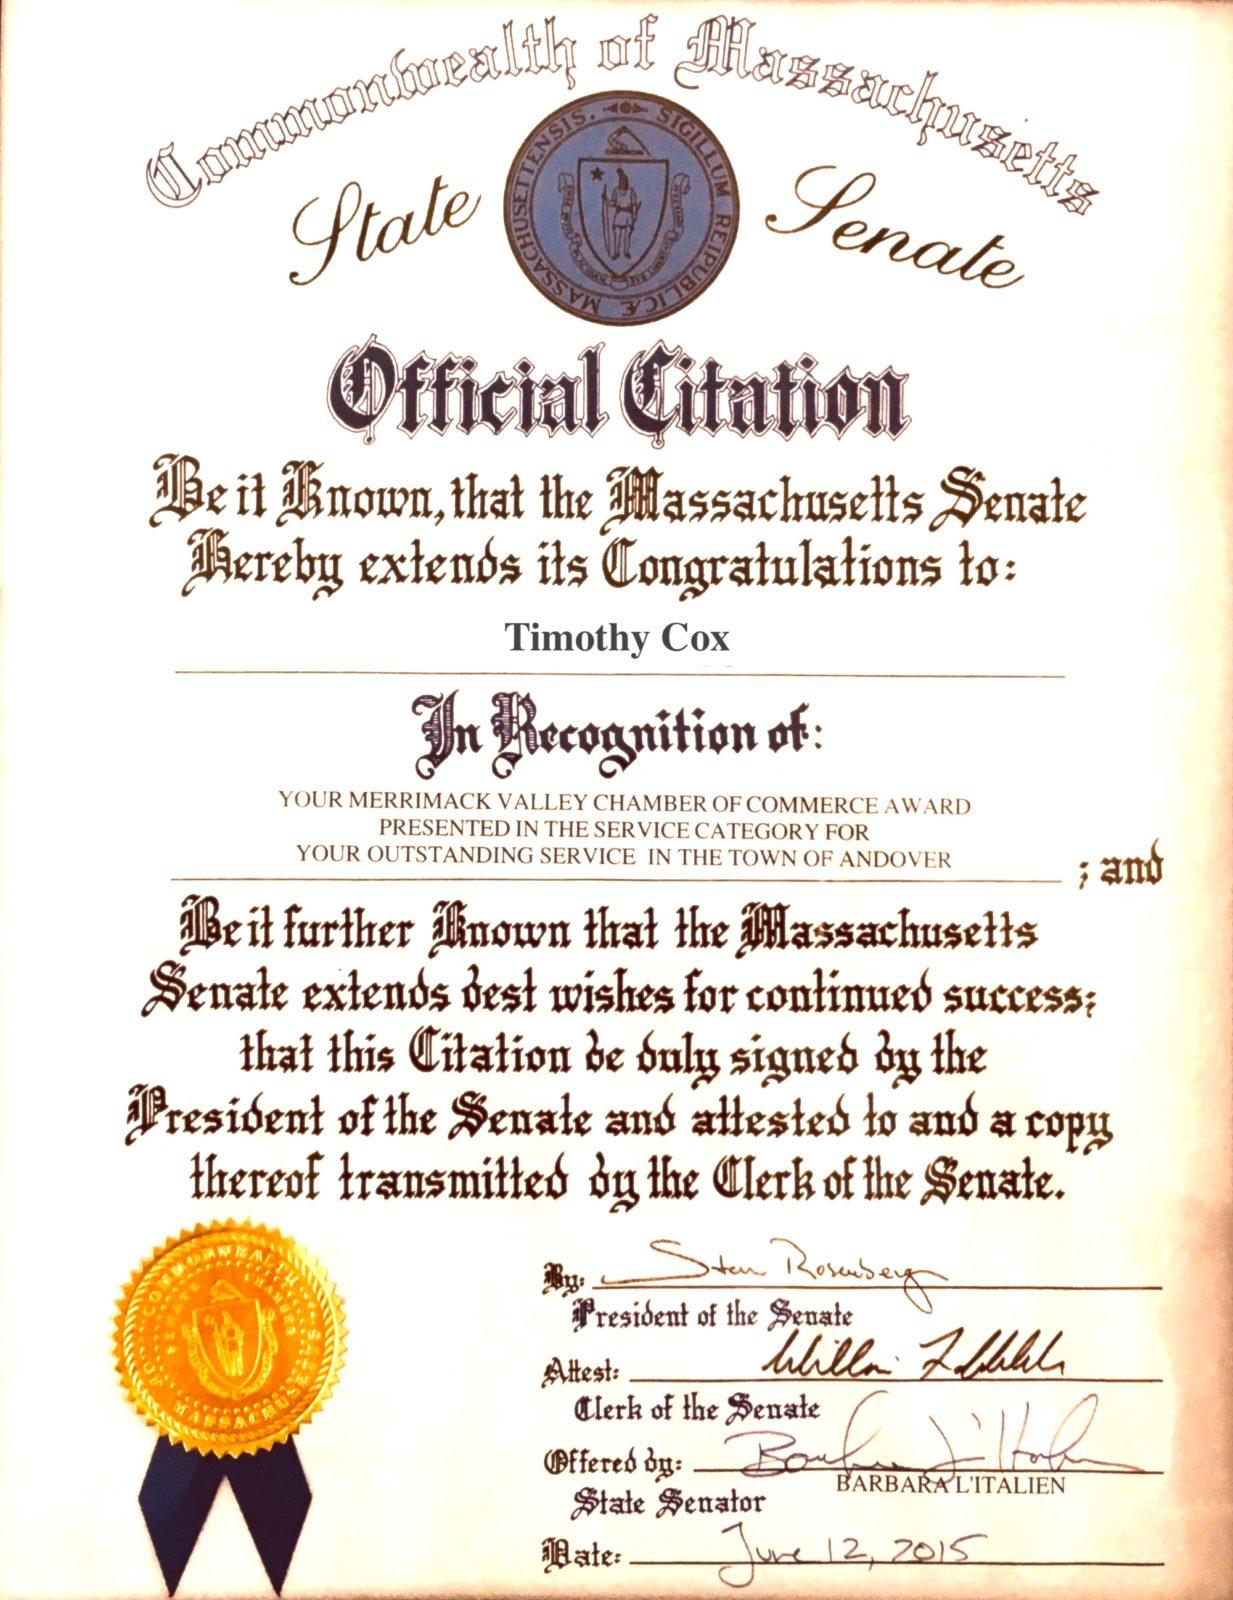 State Senate Official Citation